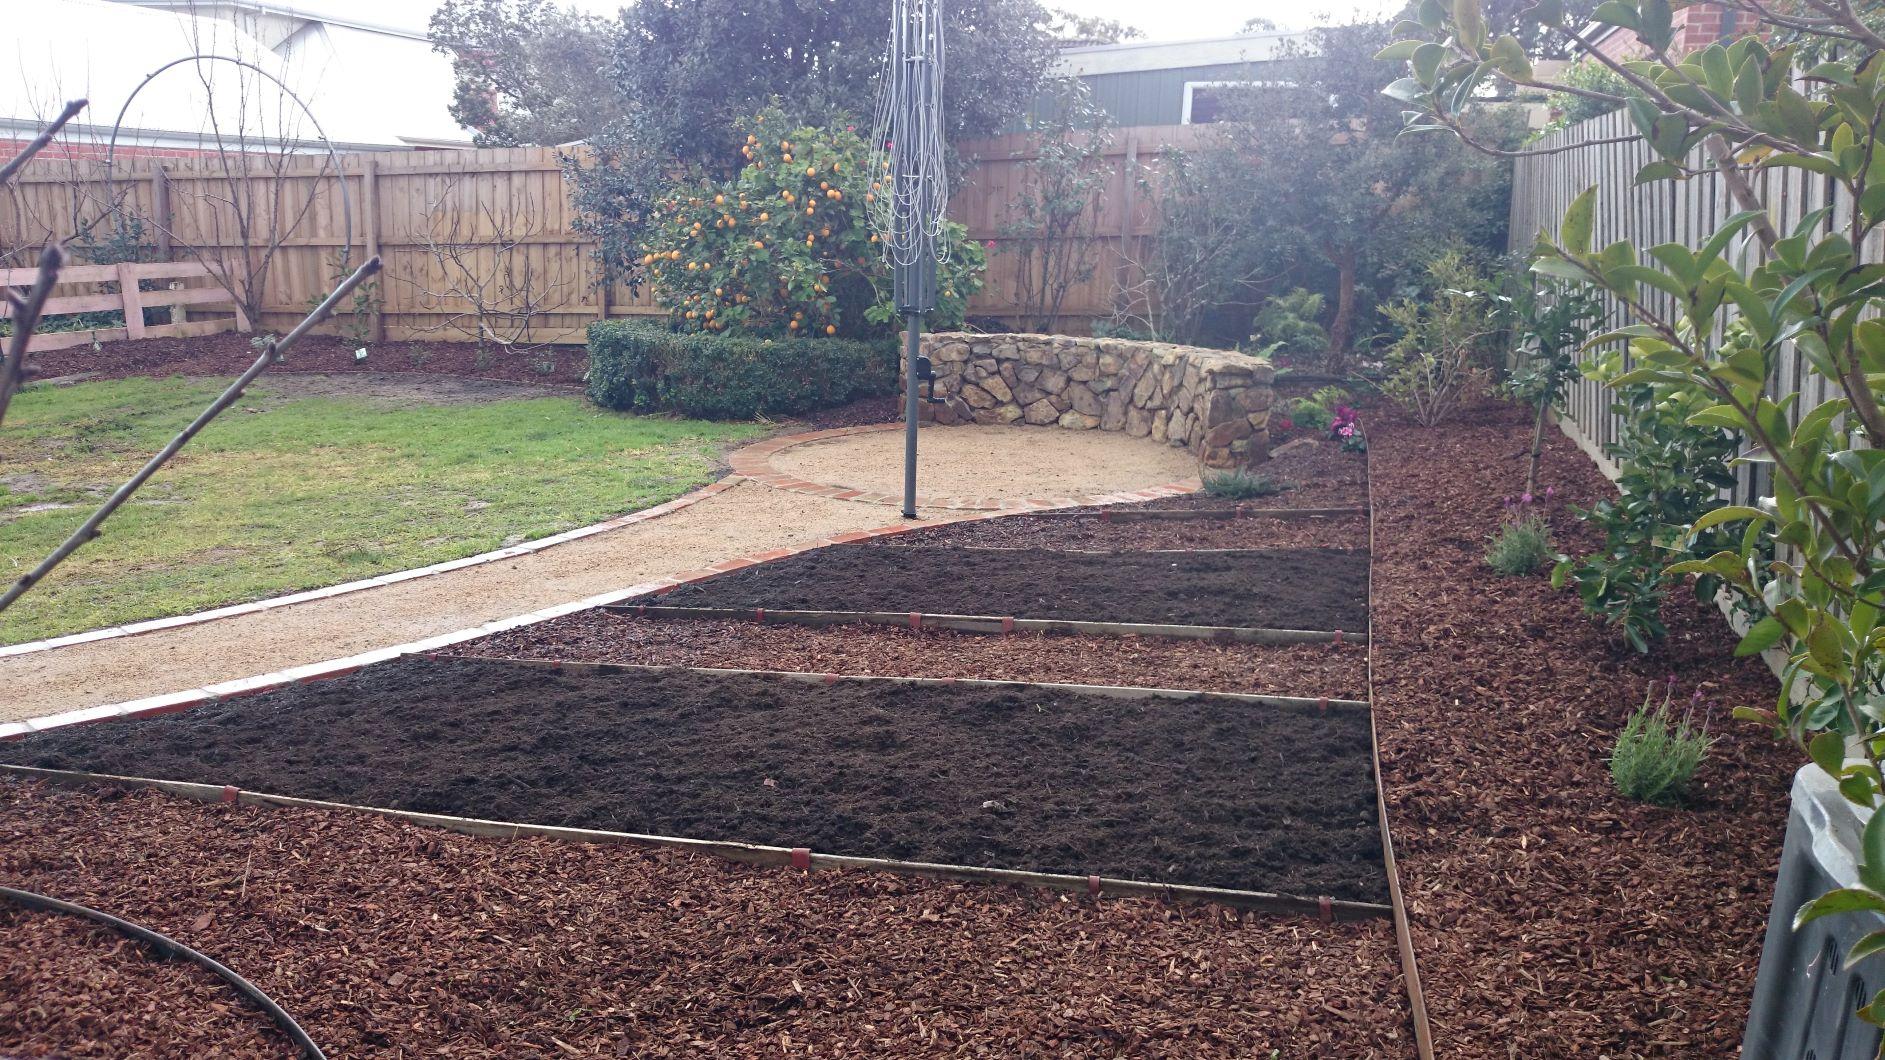 Veggie garden beds, mulch, compacted sandstone